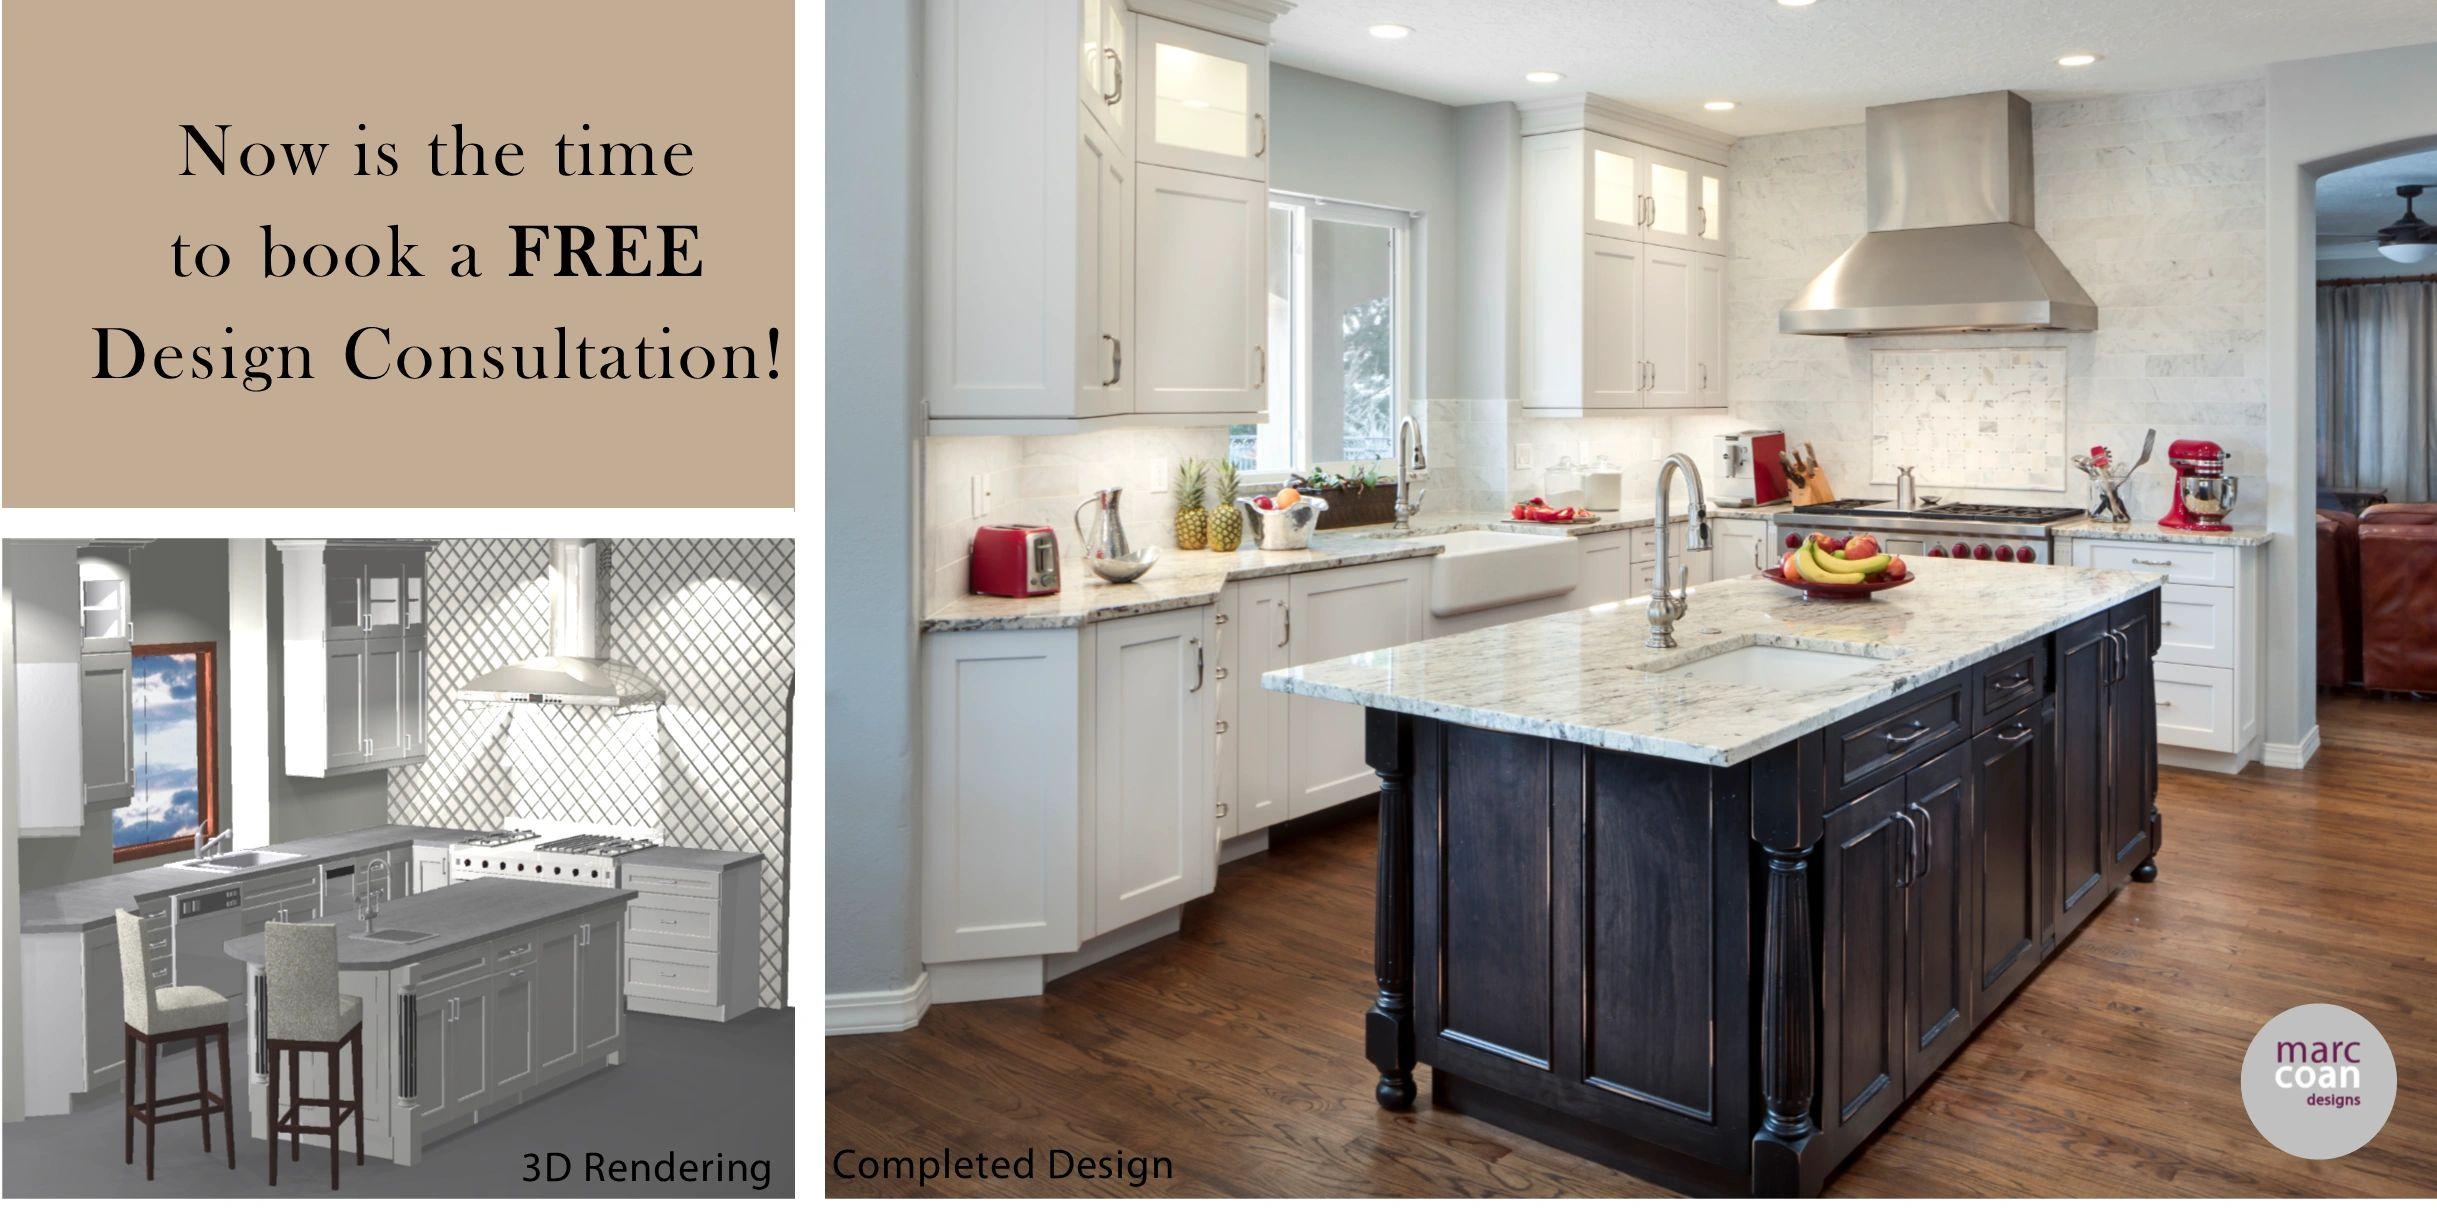 Bath and Kitchen Design Albuquerque - Marc Coan Designs LLC